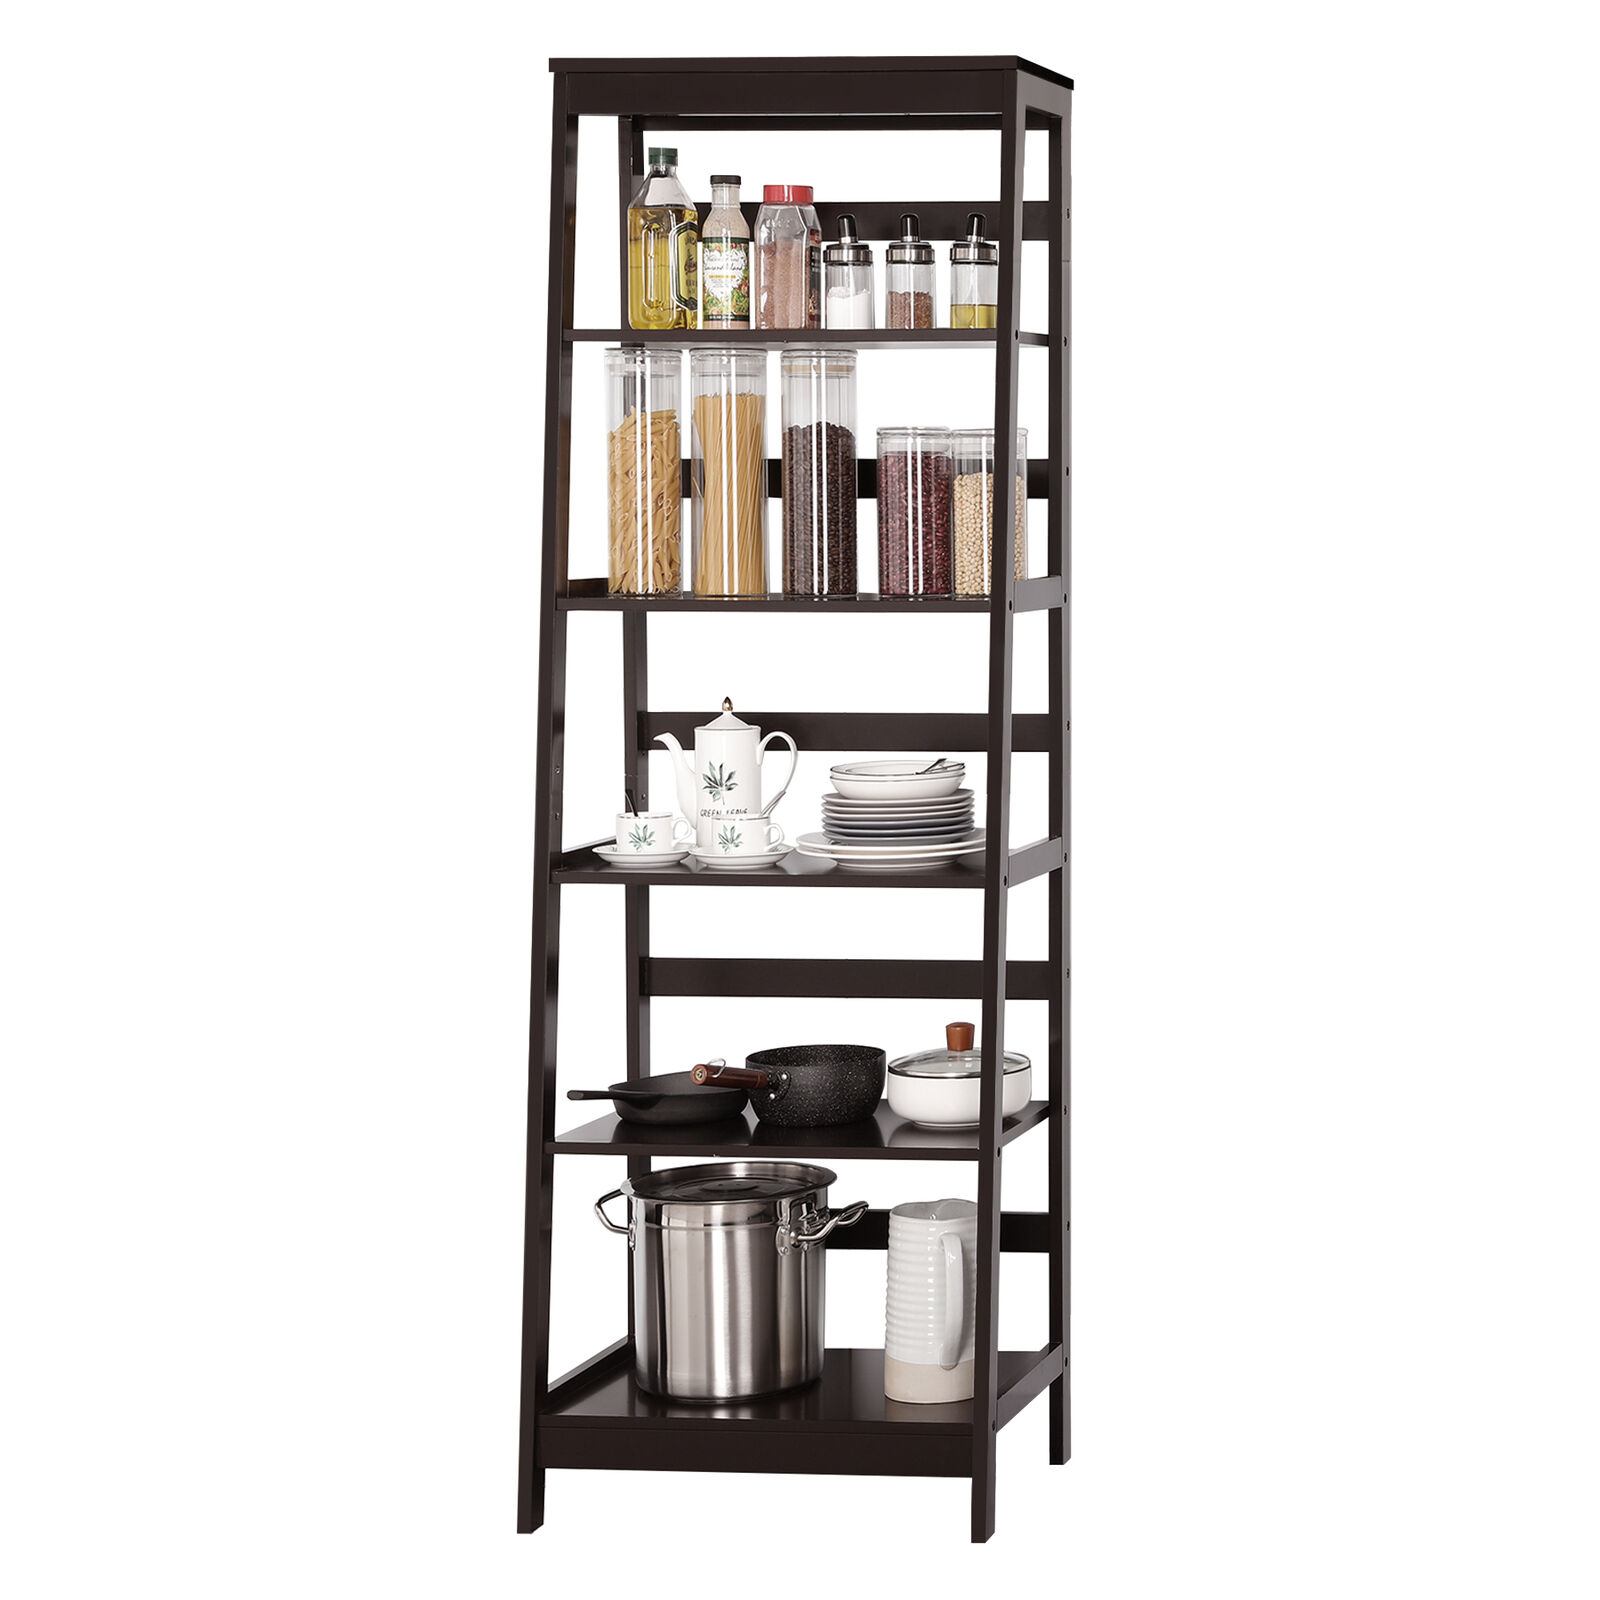 Ladder Bookcase Bookshelf Kitchen Office Storage Display Leaning Wall Shelves